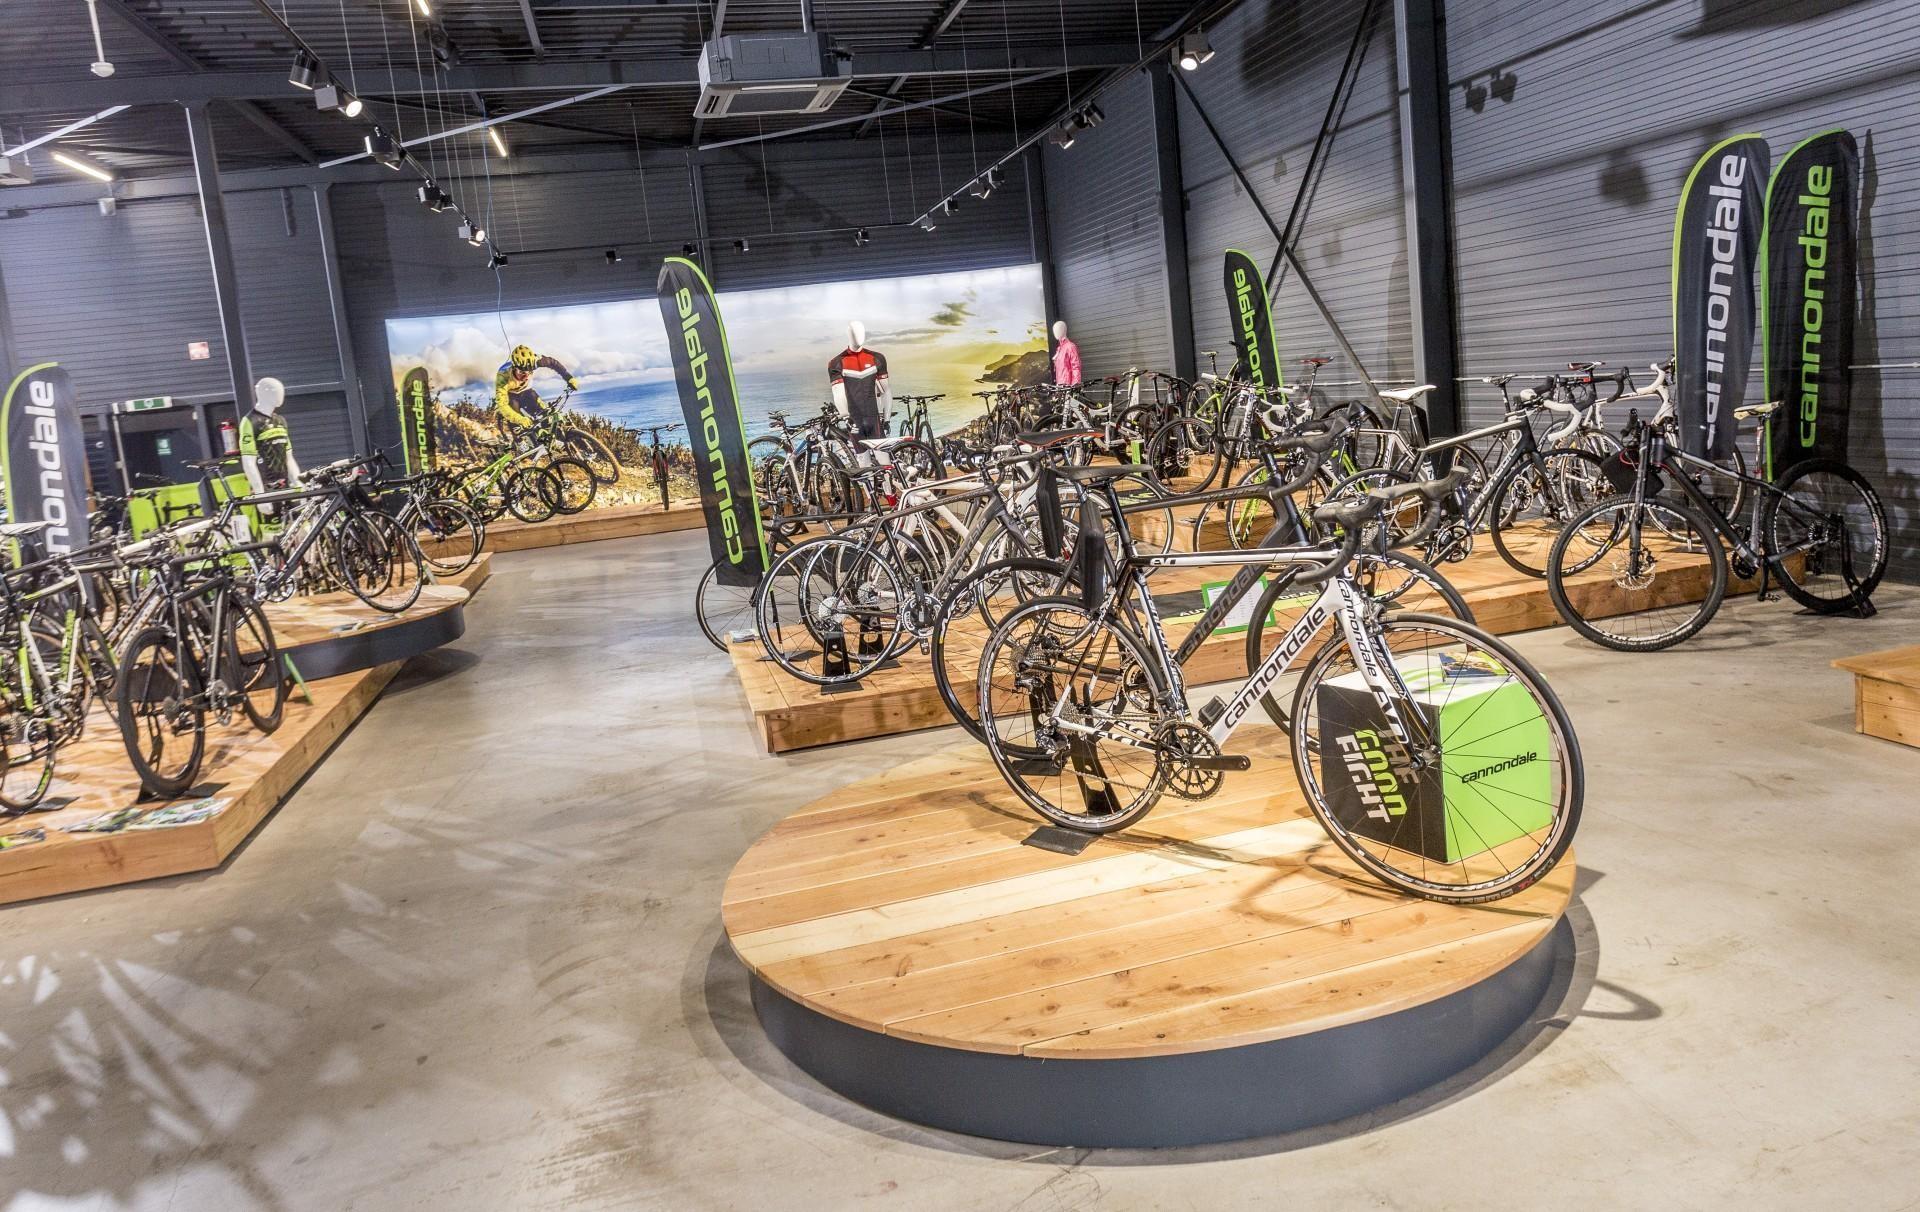 Cycle Center Zaltbommel 1176.jpg